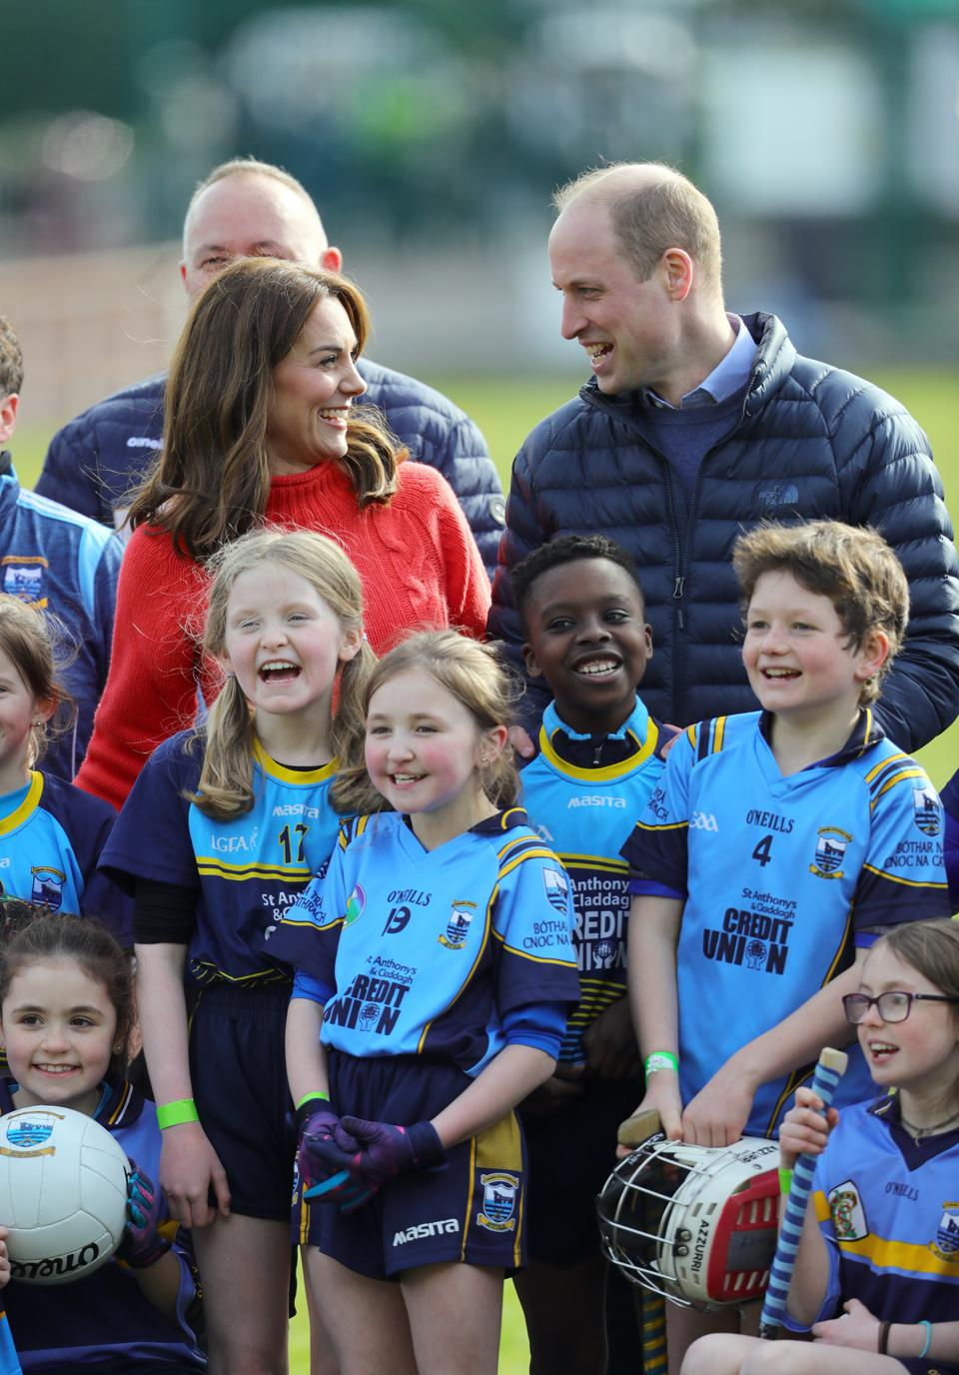 The Duke and Duchess of Cambridge visit Ireland - Day 3